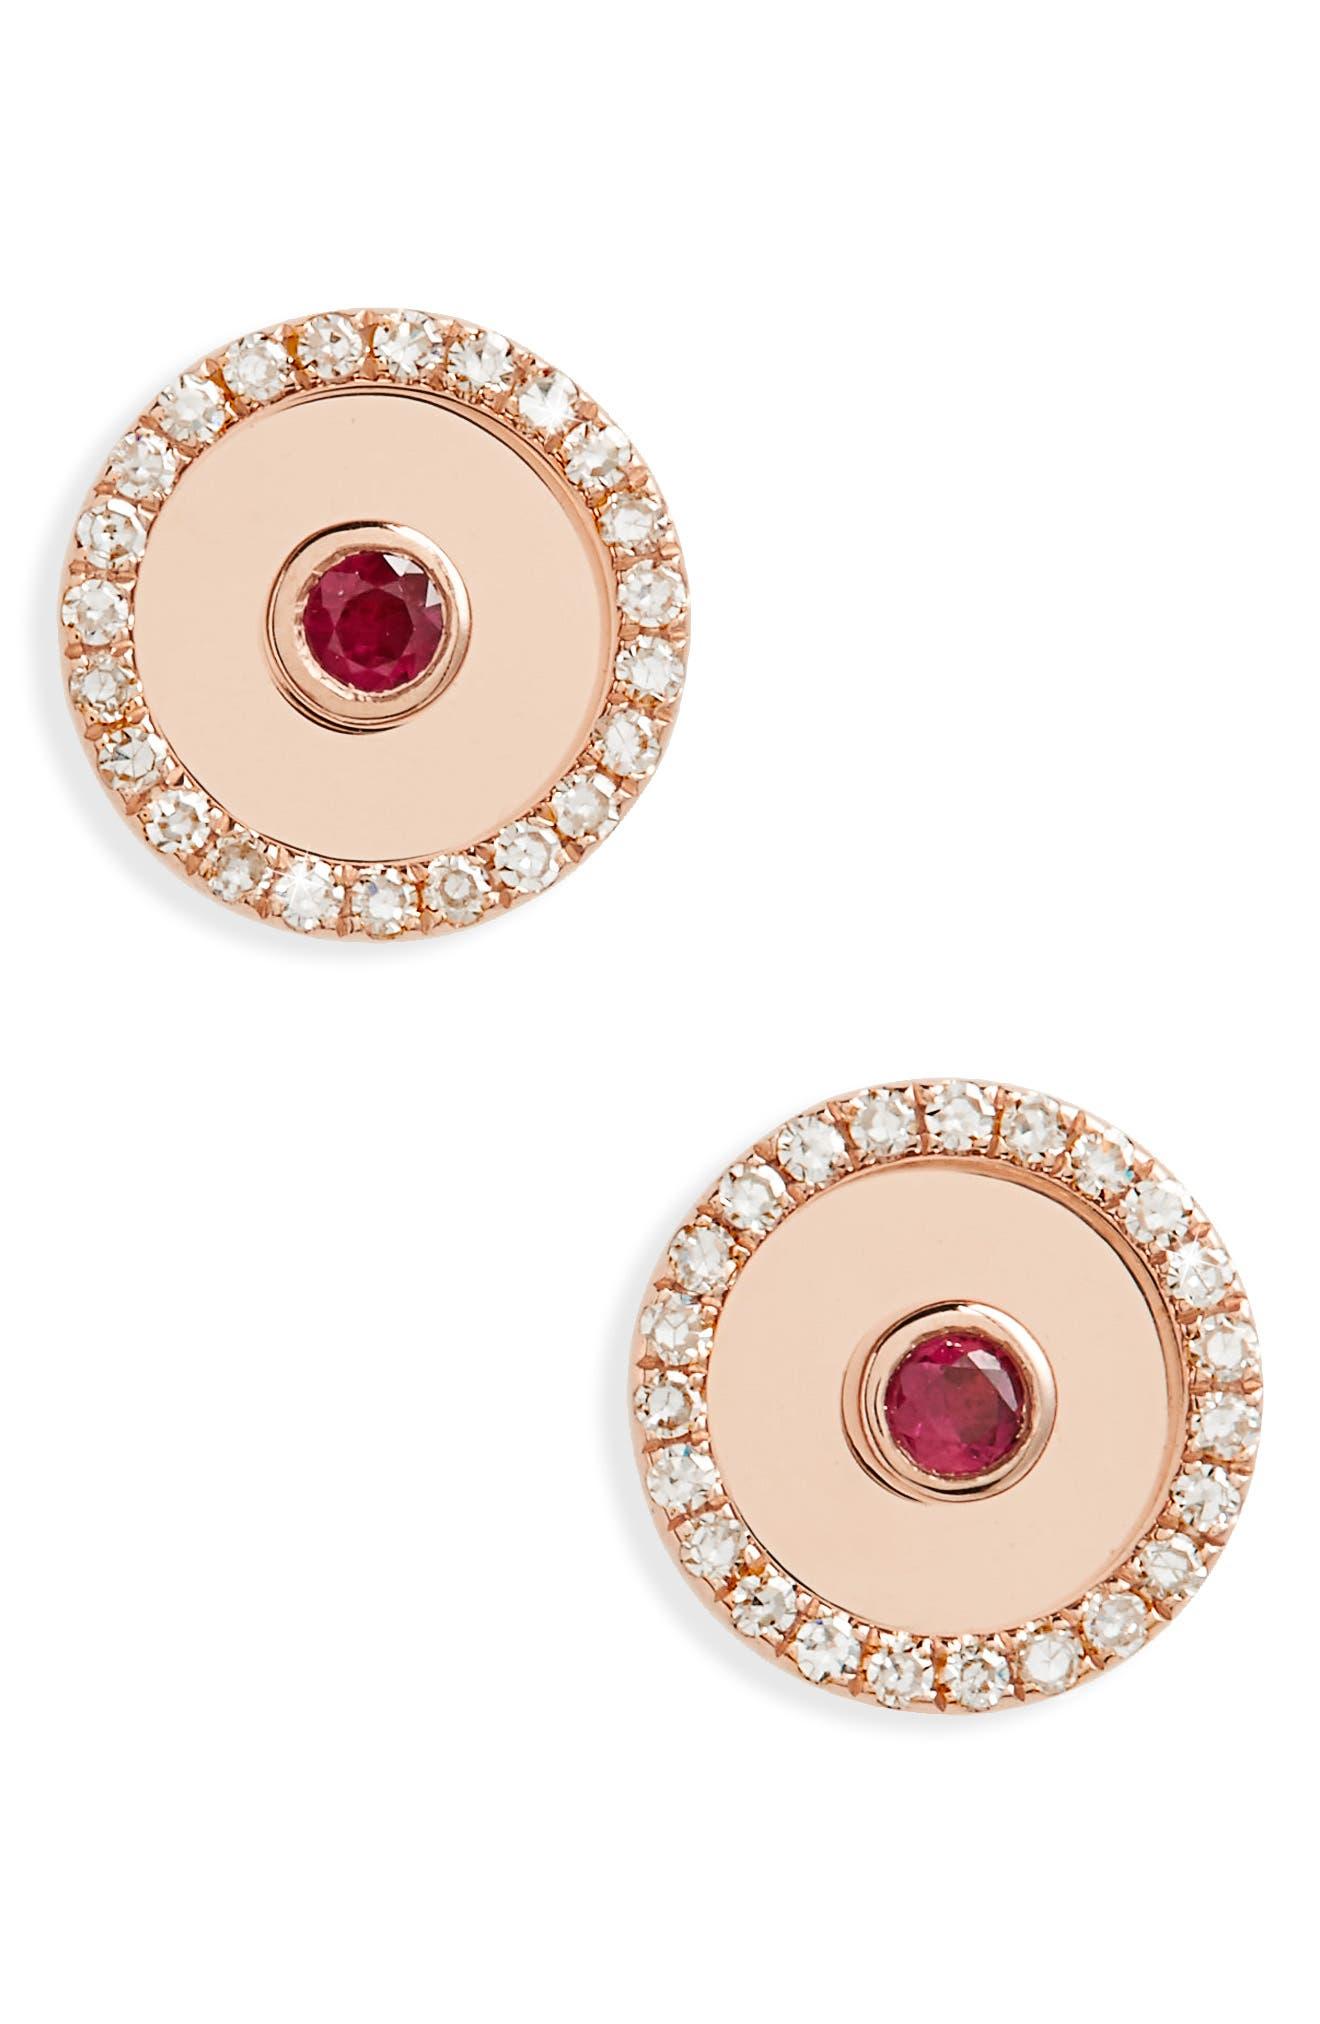 Diamond Bullseye Stud Earrings,                         Main,                         color, Rose Gold